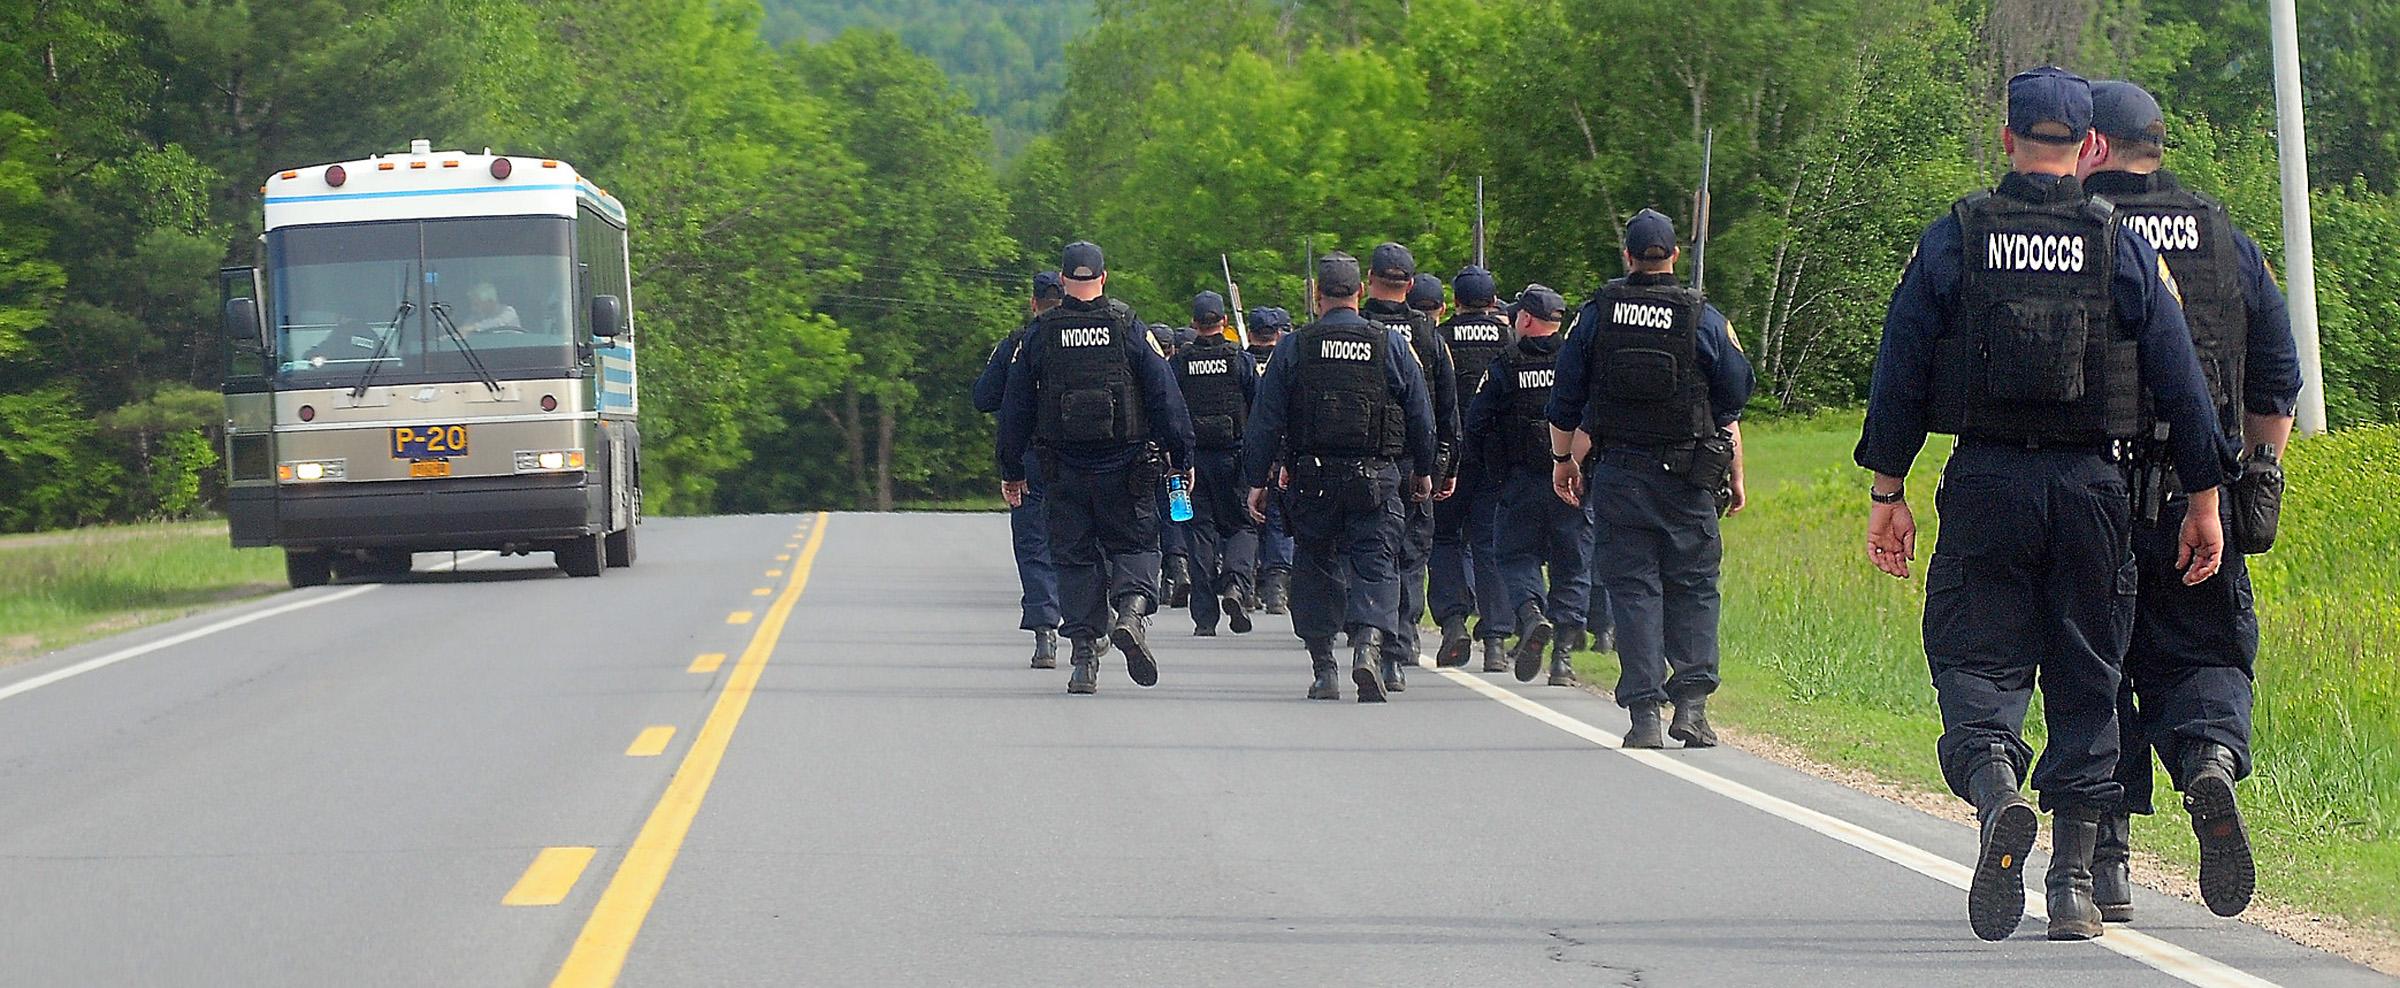 Dannemora, NY - Cuomo: Prison Escape Probe Focuses On Likely